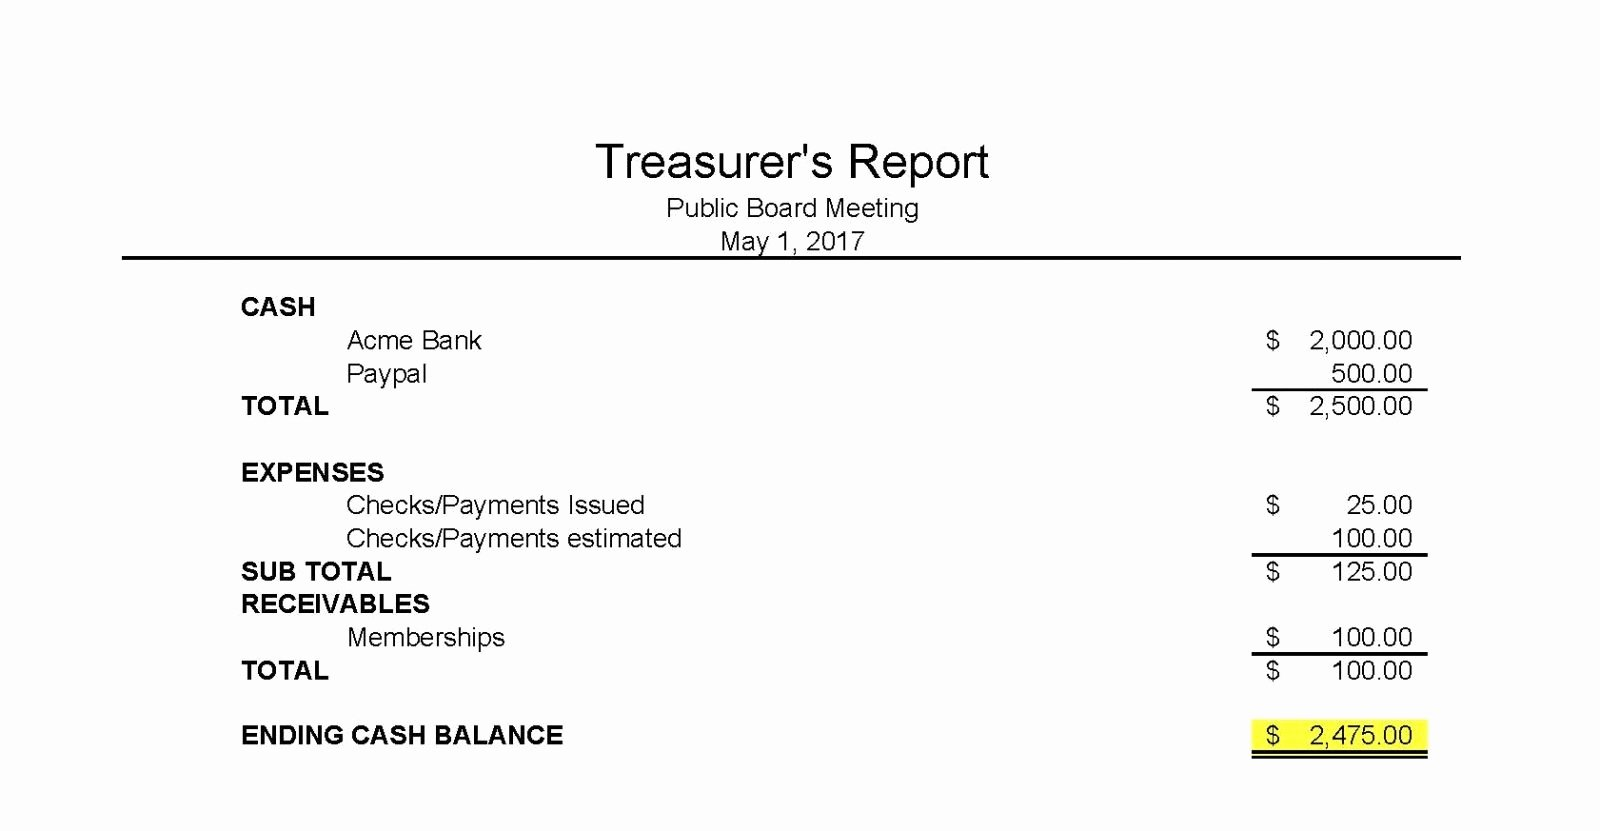 Treasurer Report Template Excel Luxury Treasurers Report Templateasurer Essential Print S Maggi